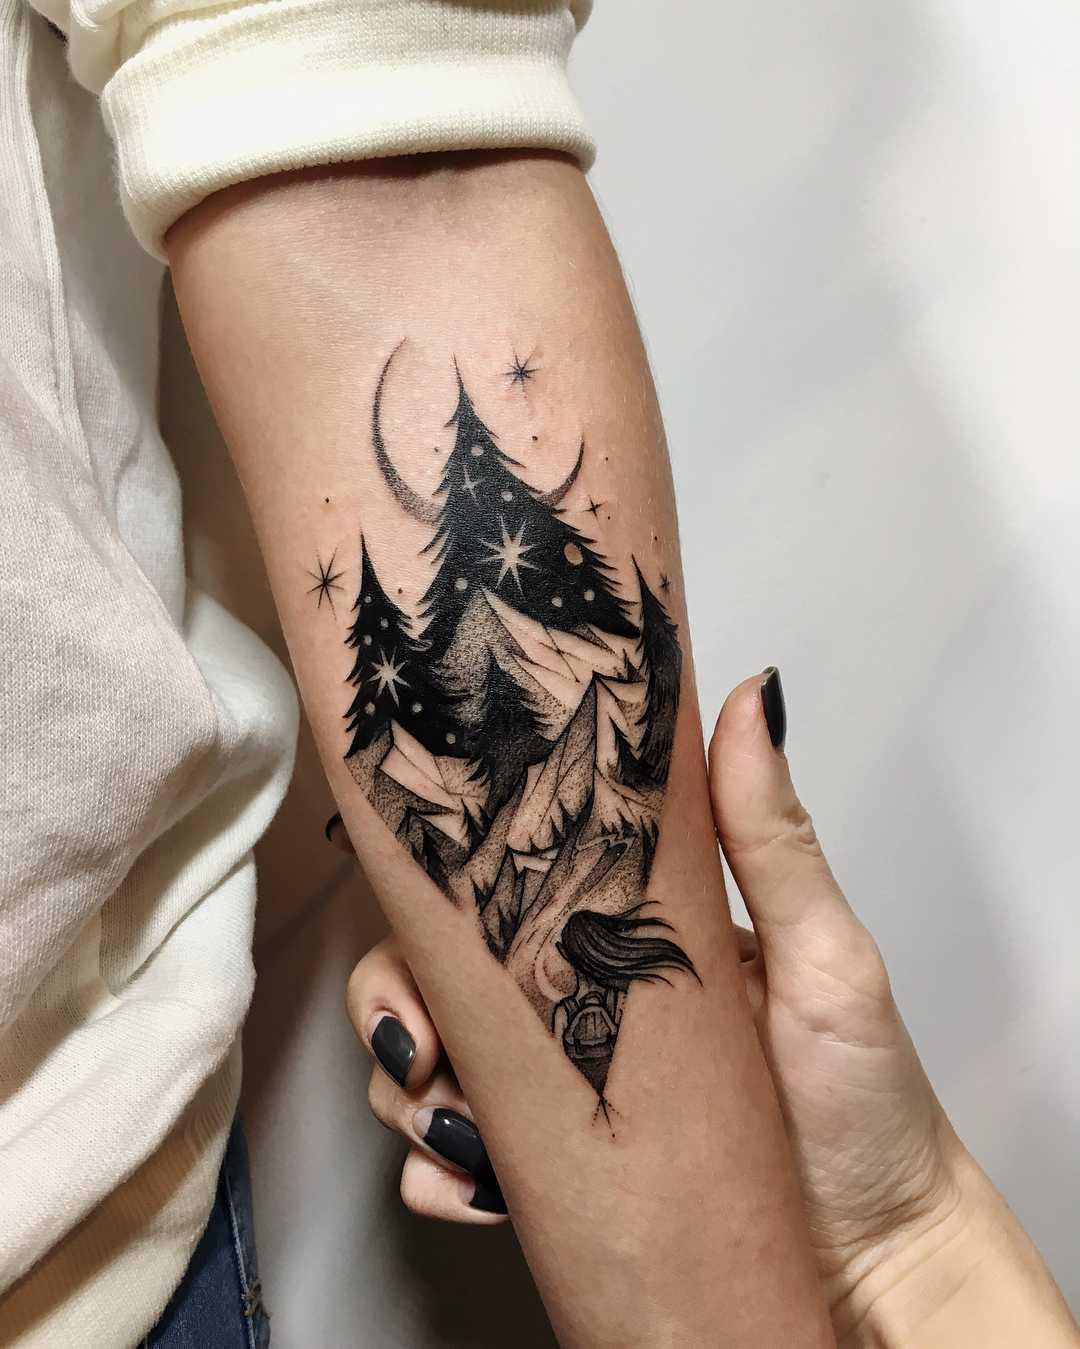 Tattoo for an explorer by Sasha Kiseleva